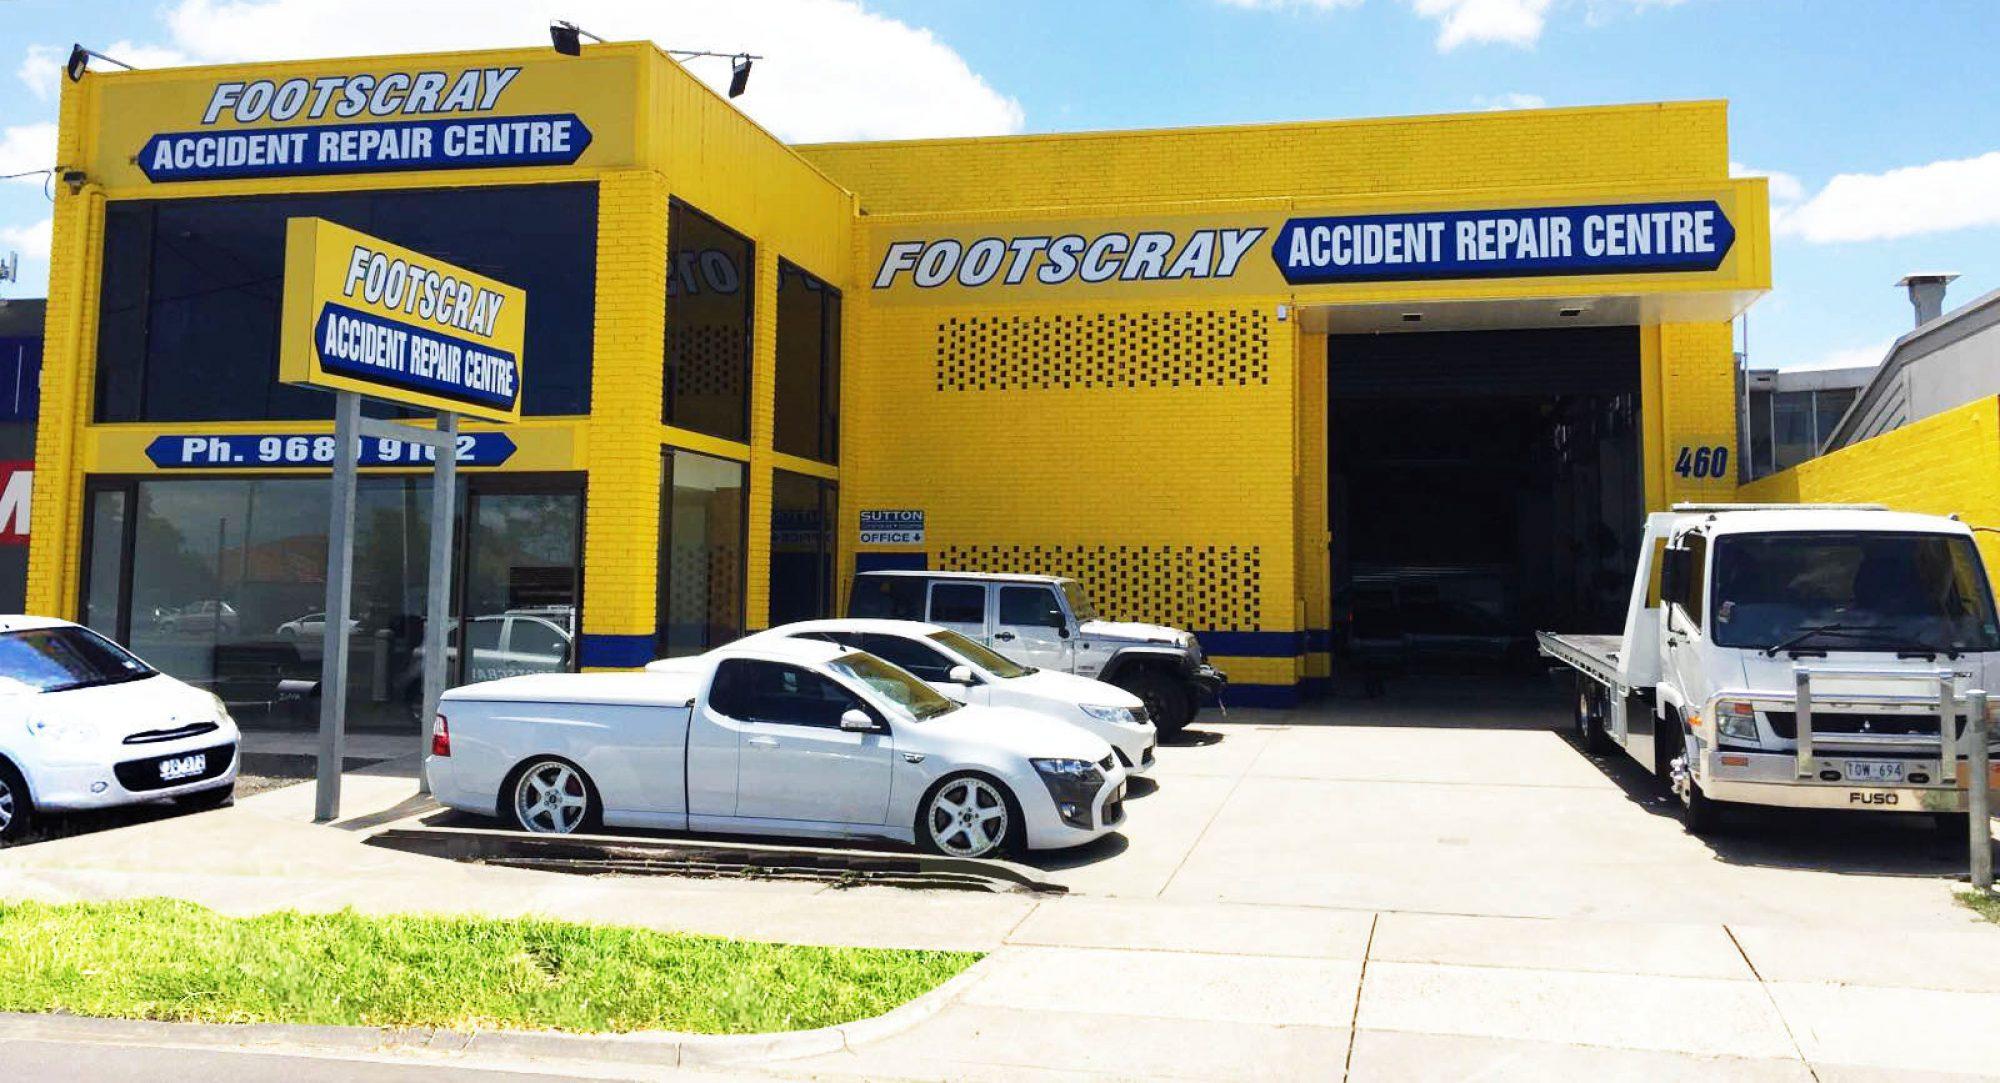 dvojtek – Footscray Accident Repair Centre